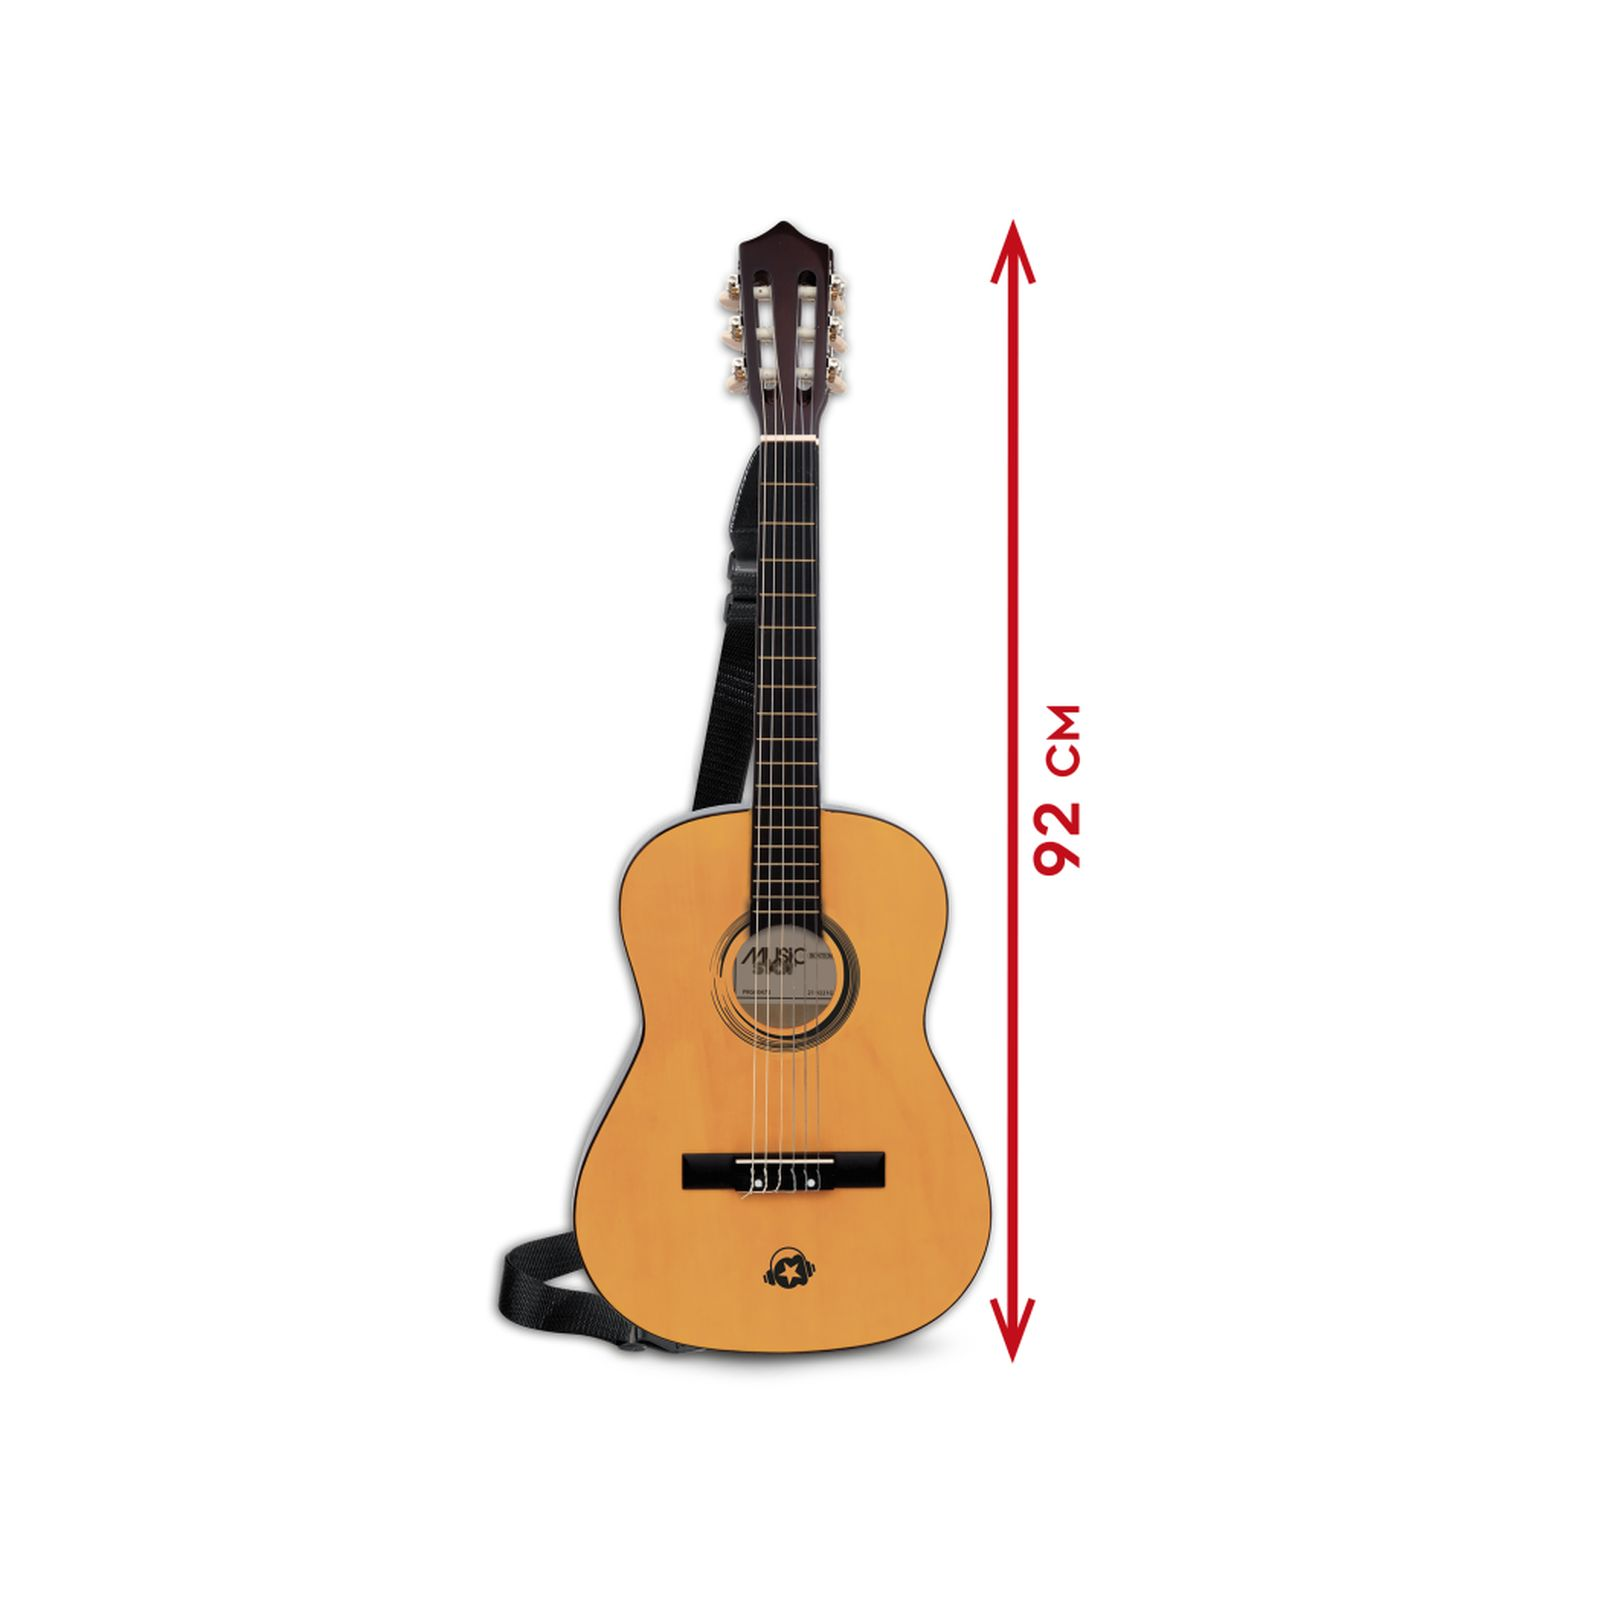 Chitarra classica 92 cm - MUSICSTAR